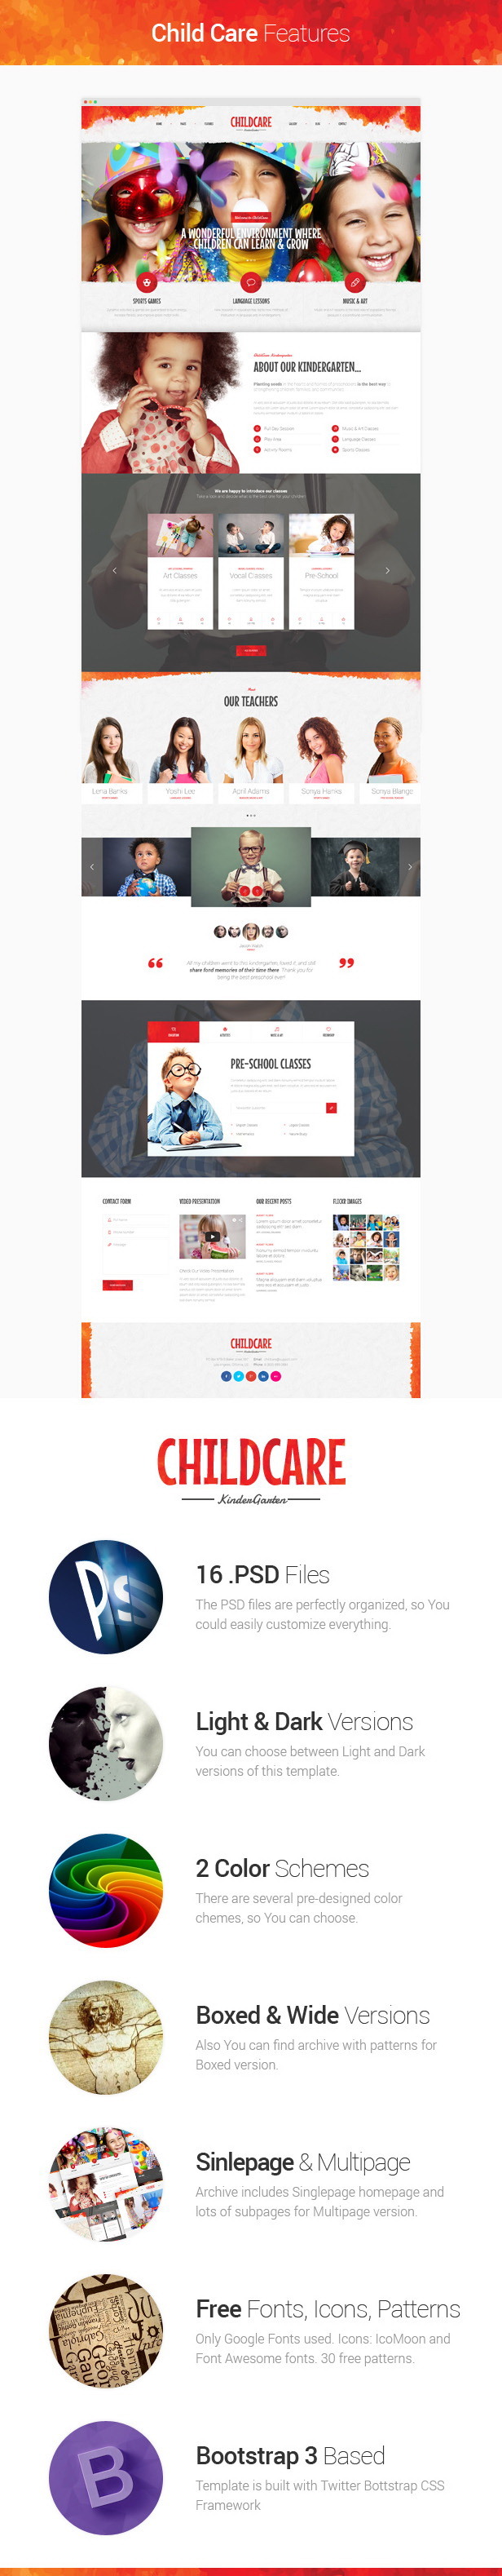 Child Care - Children & Kindergarten Template description